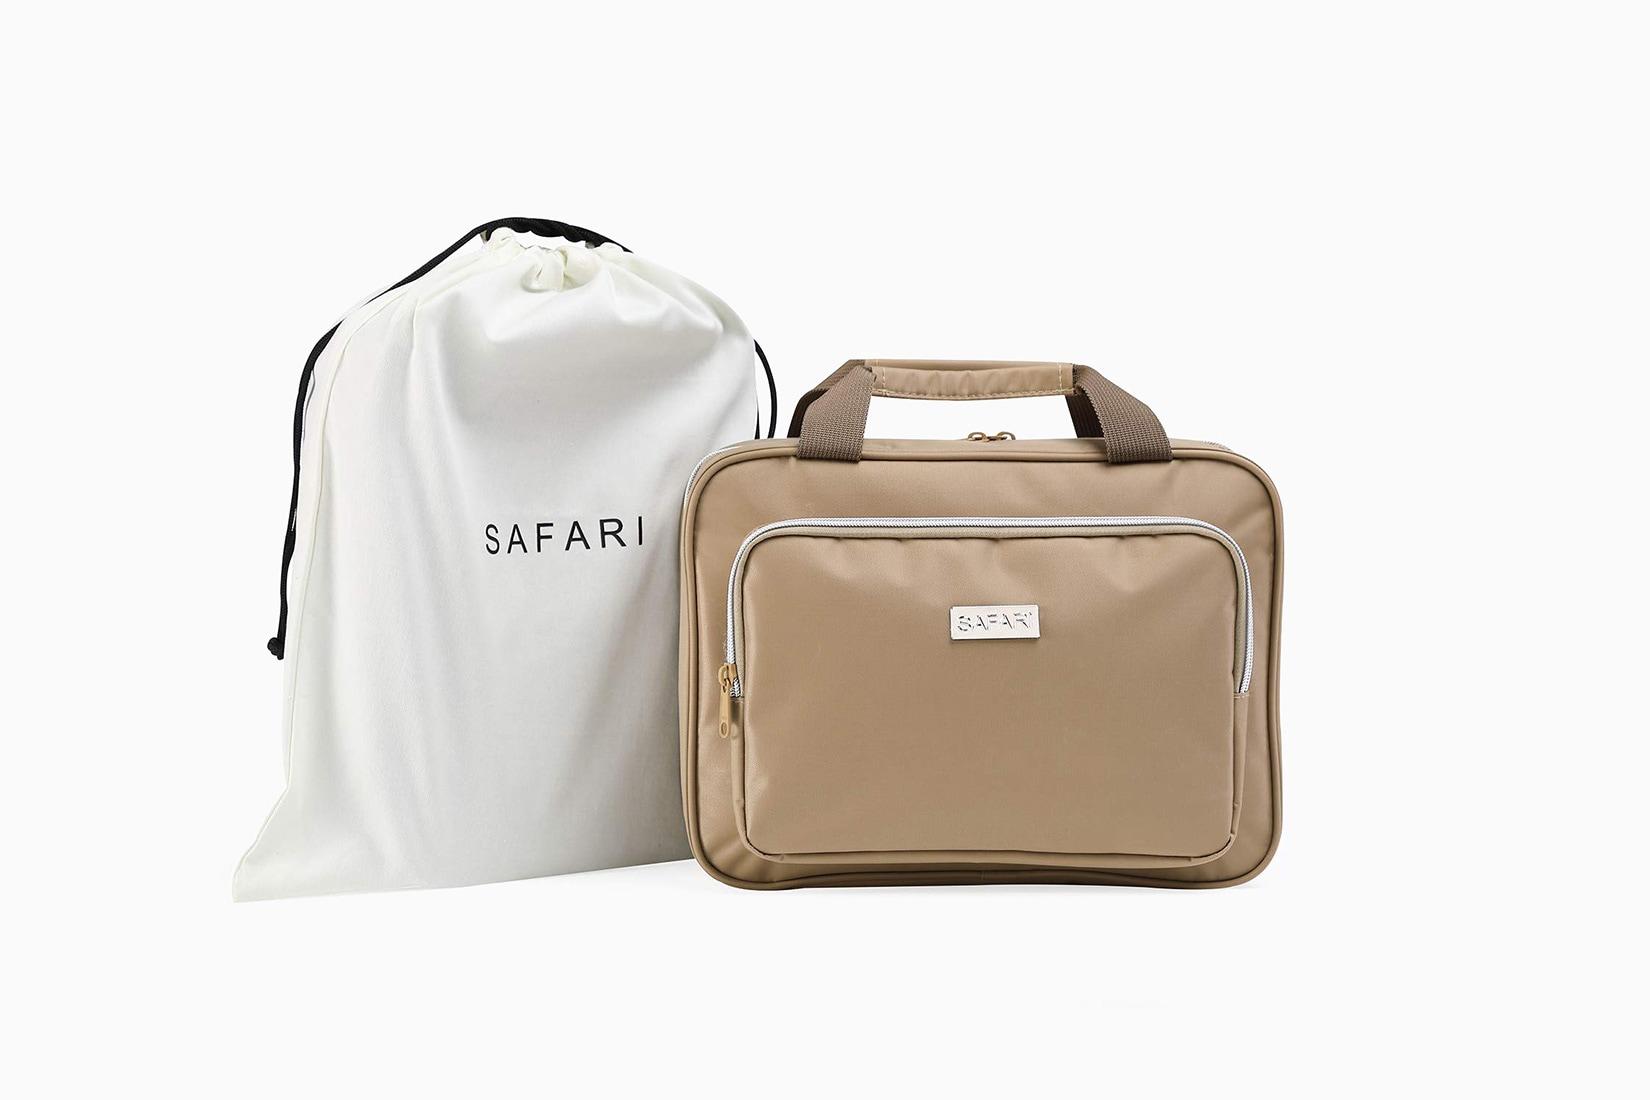 best toiletry bag women family size safari - Luxe Digital